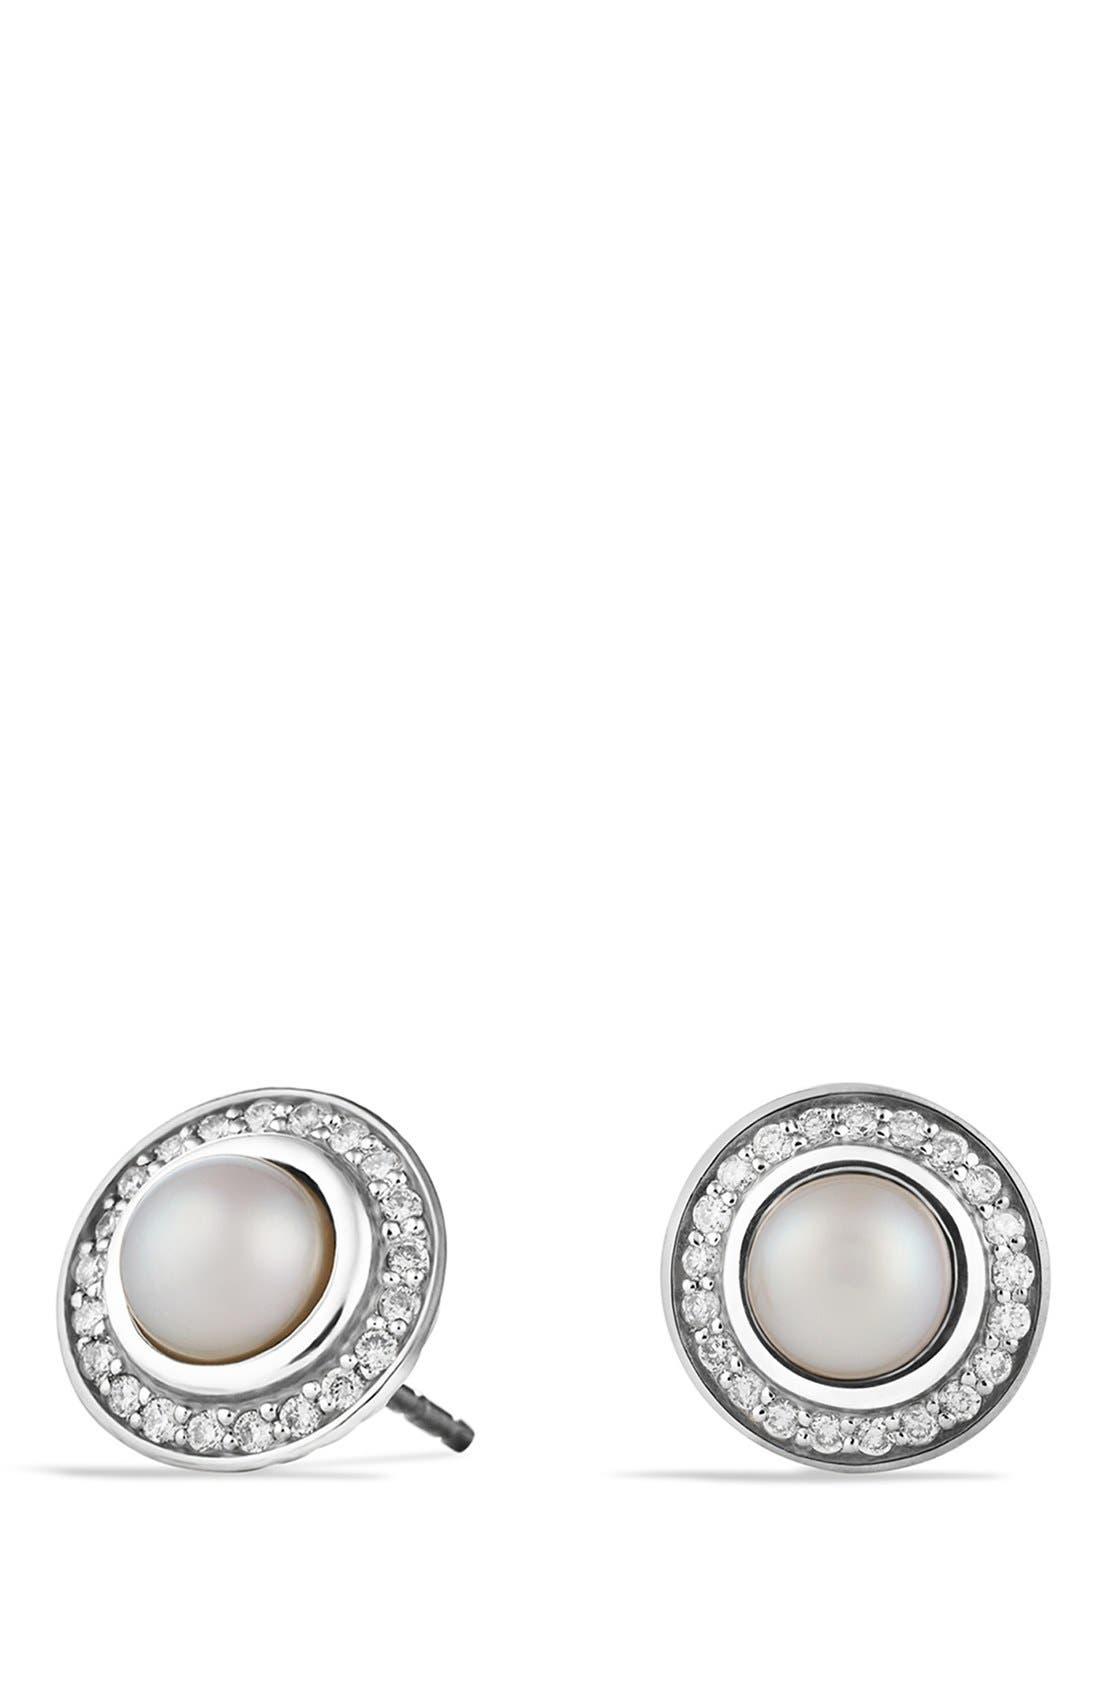 DAVID YURMAN Cerise Mini Earrings with Semiprecious Stone & Diamonds